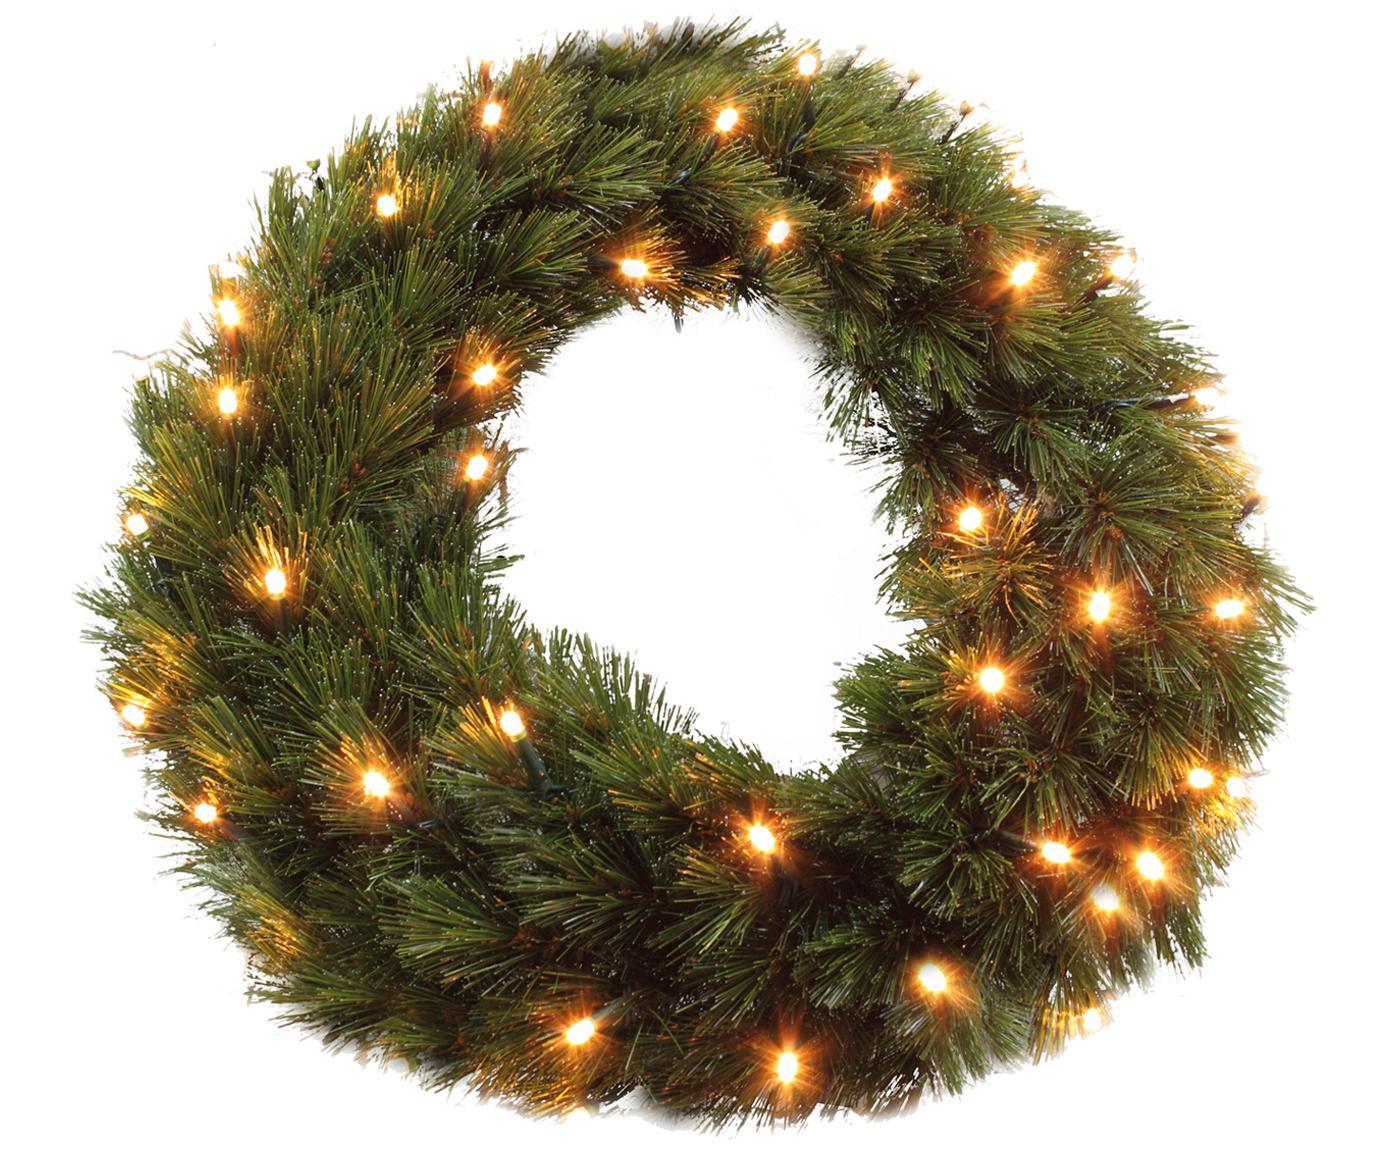 LED Weihnachtskranz Forest, Kunststoff (PVC), Grün, Ø 45 x H 10 cm